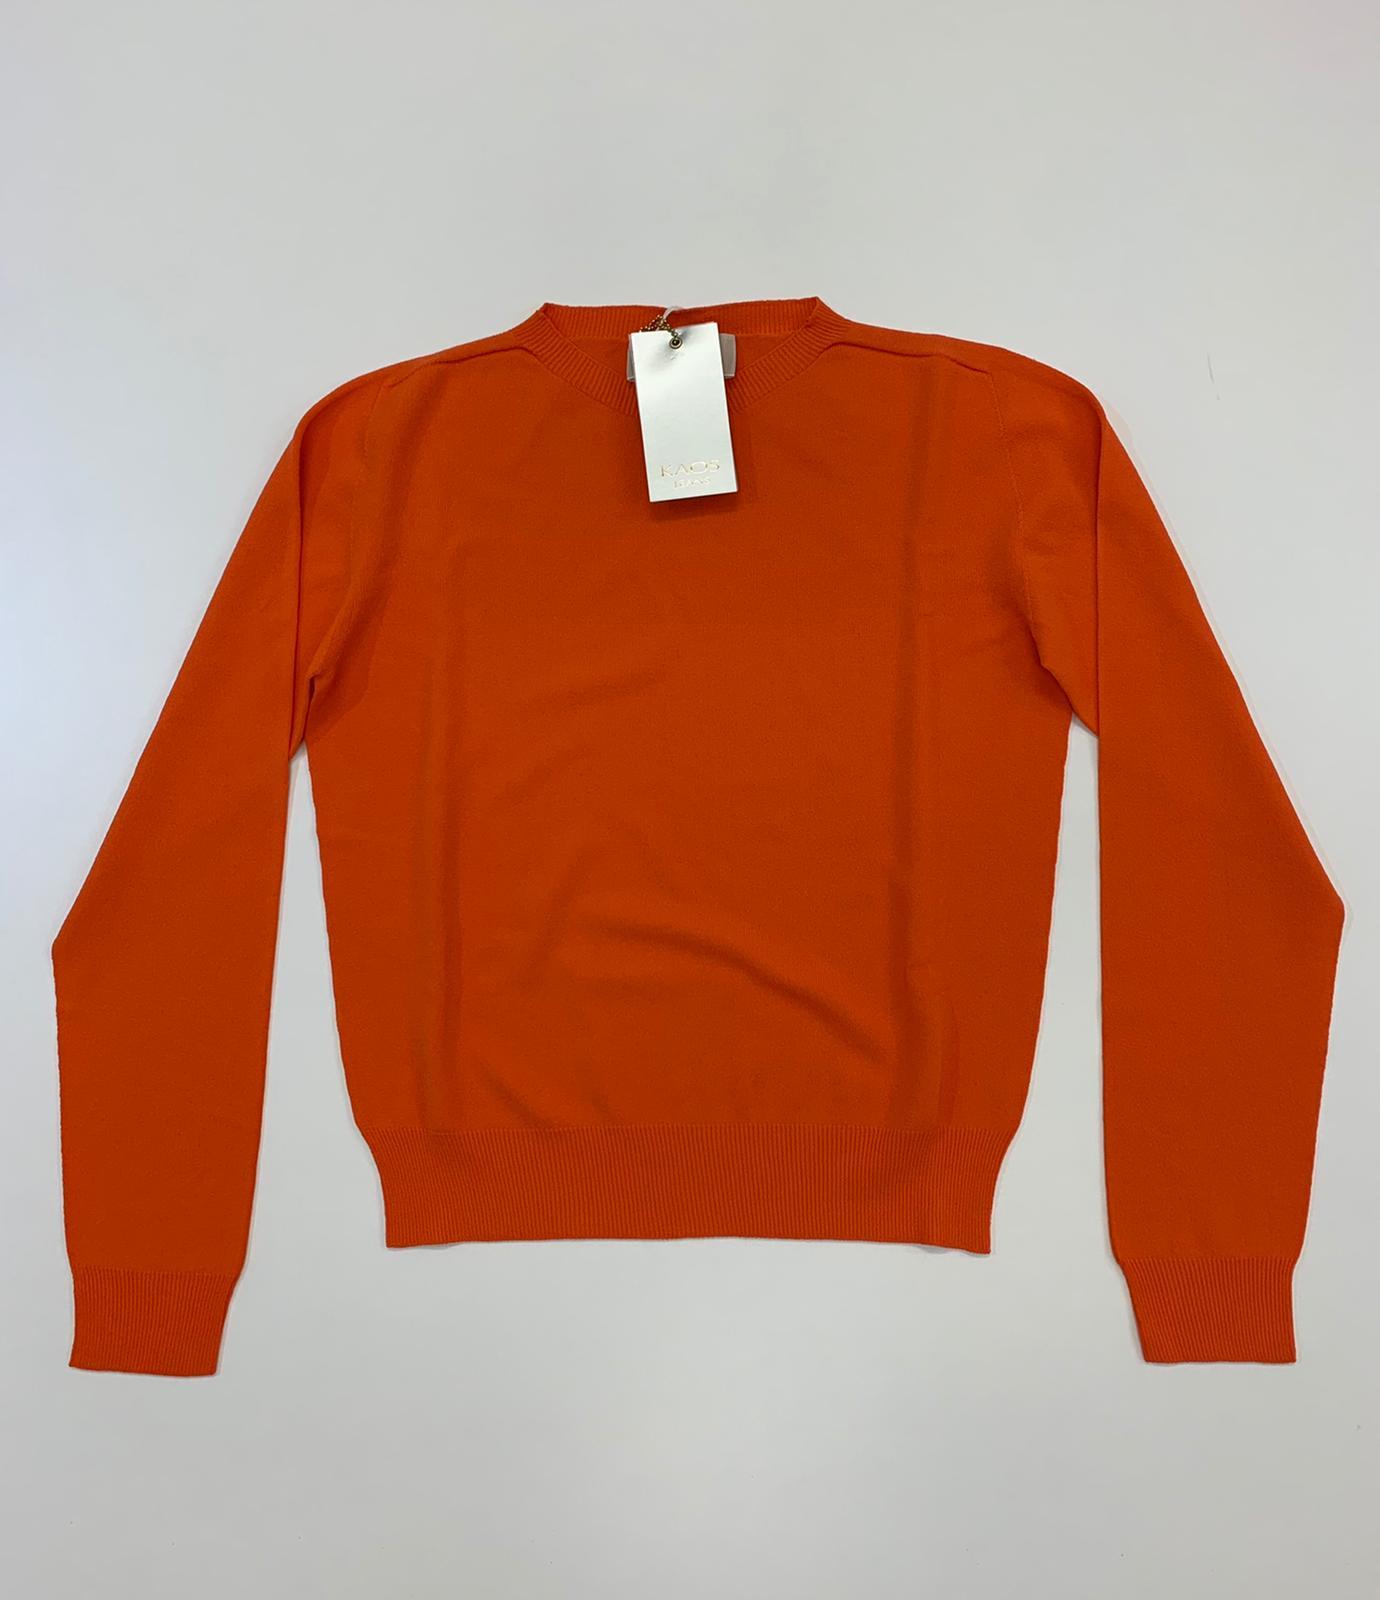 Maglia Kaos Jeans Viscosa Mandarino